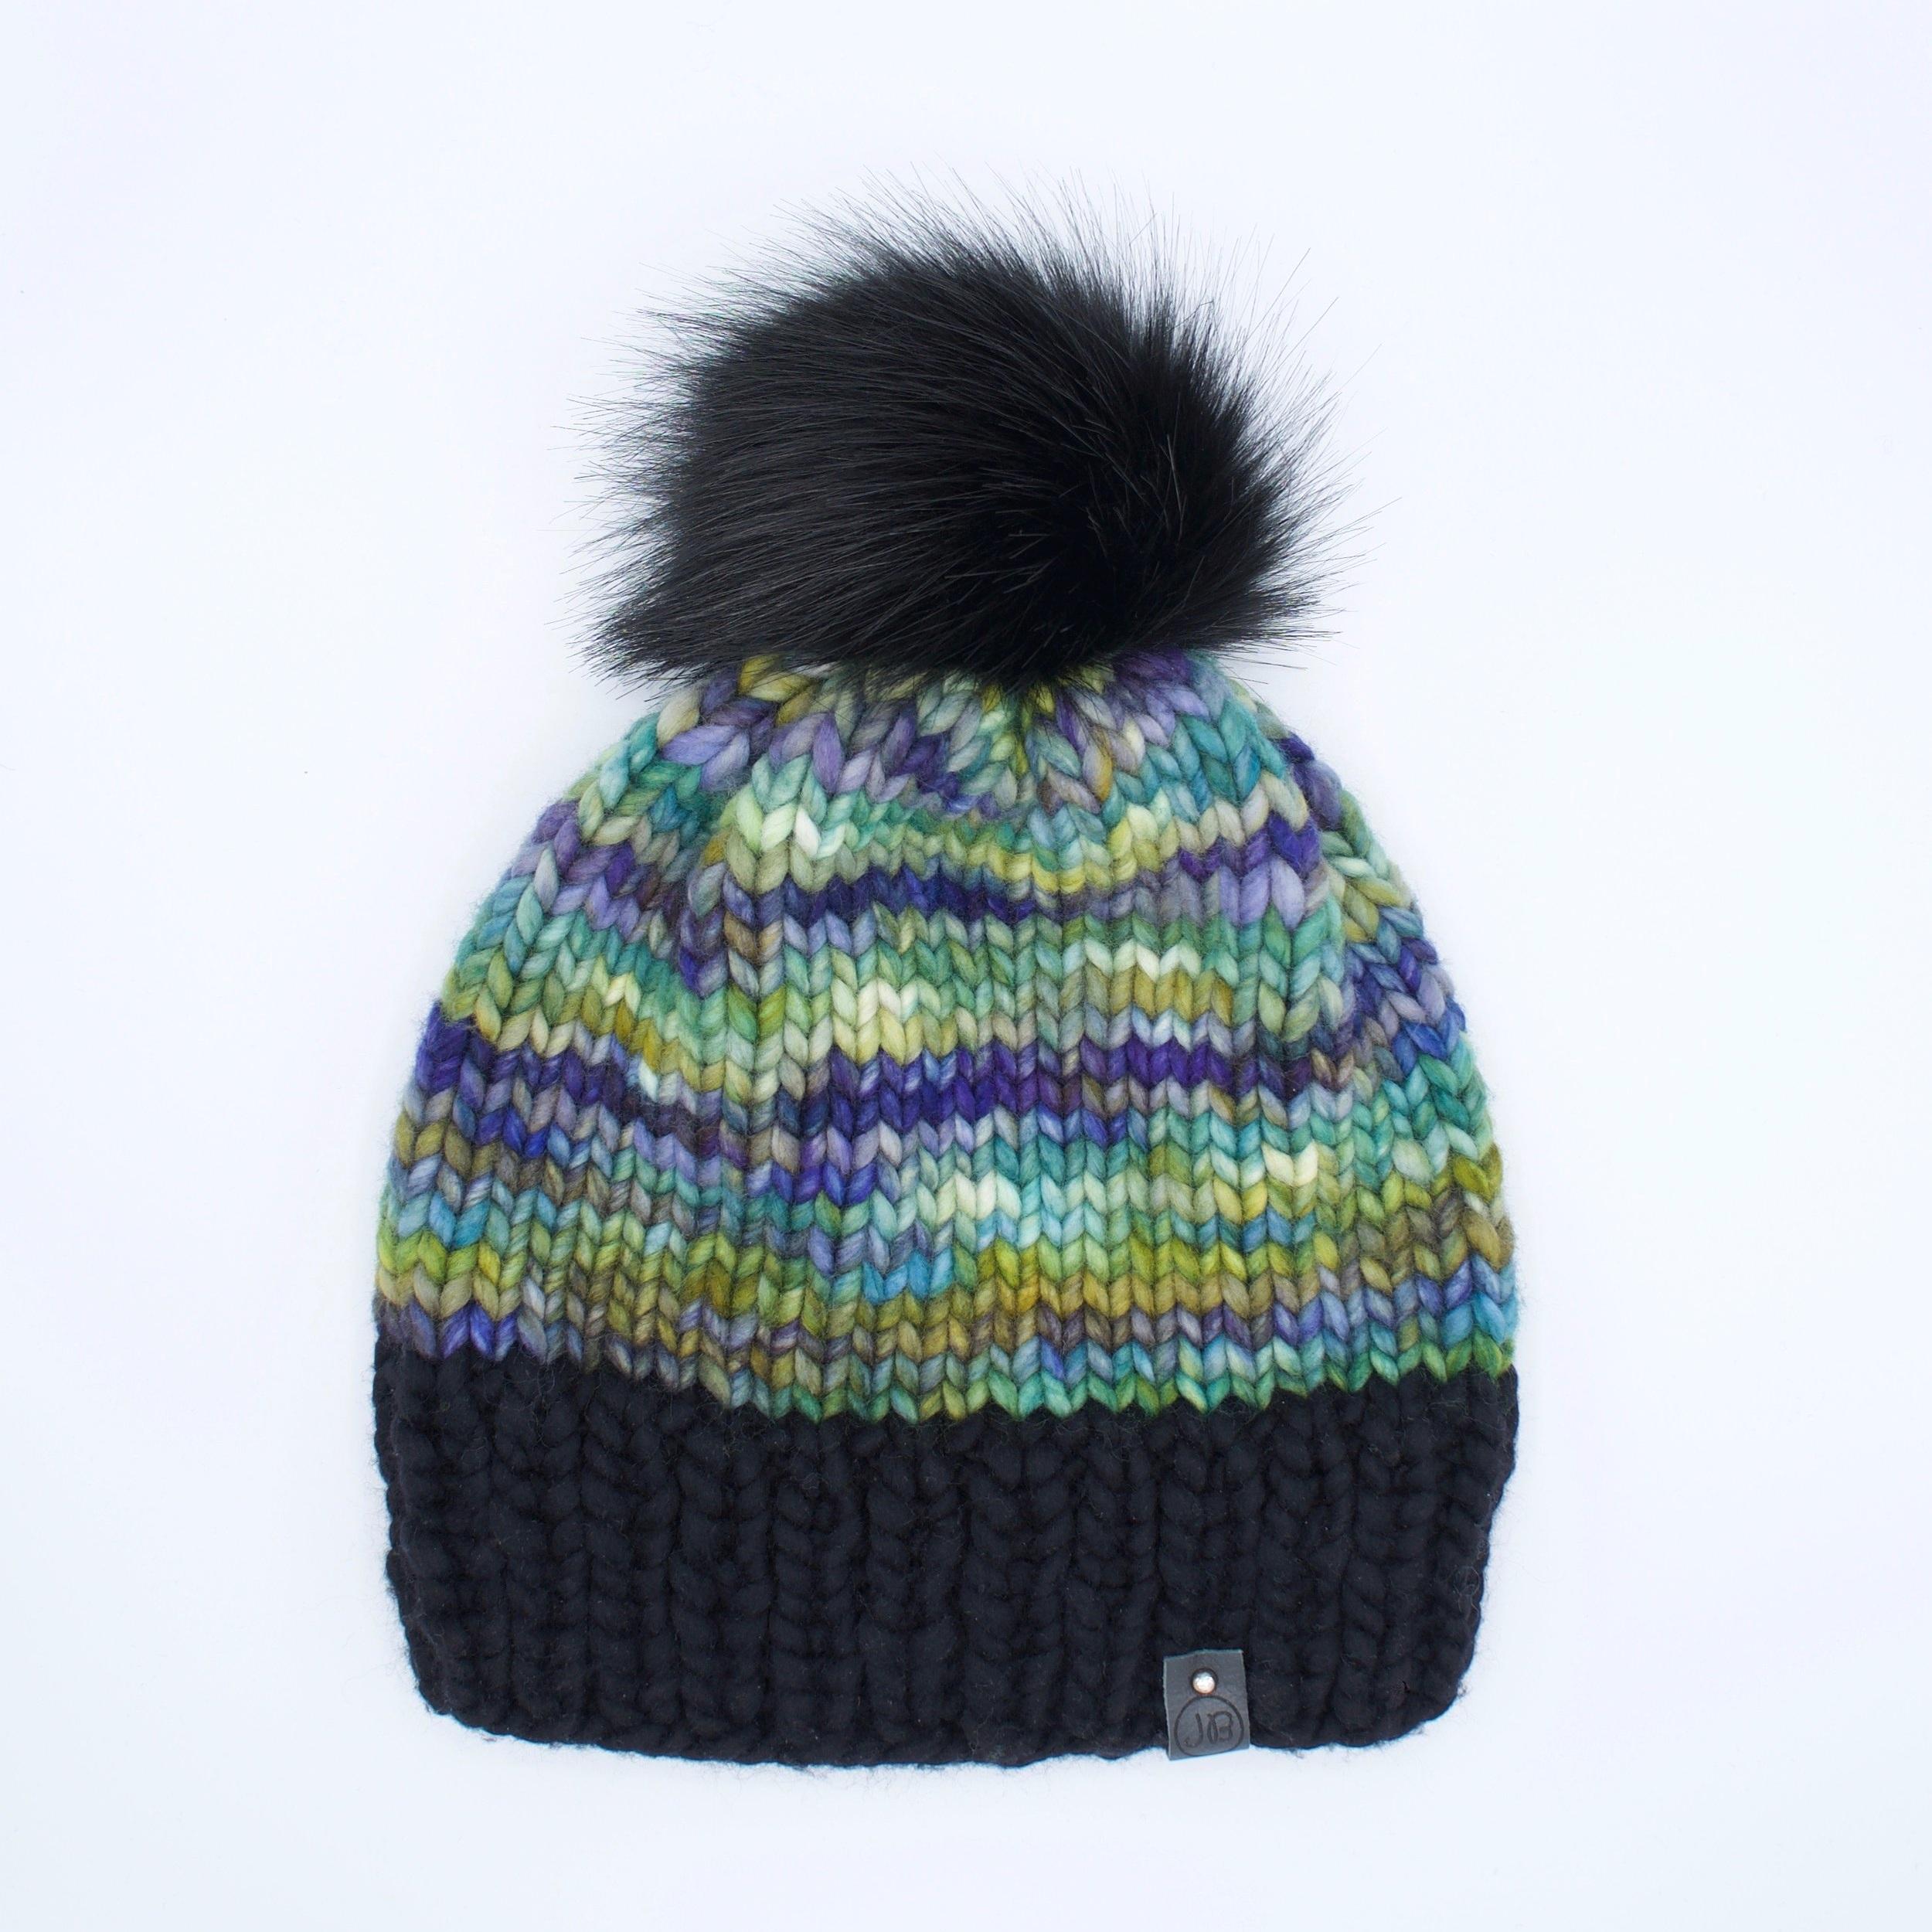 Beanie Hat with Detachable Pompom Black, Green & Purple $115.00